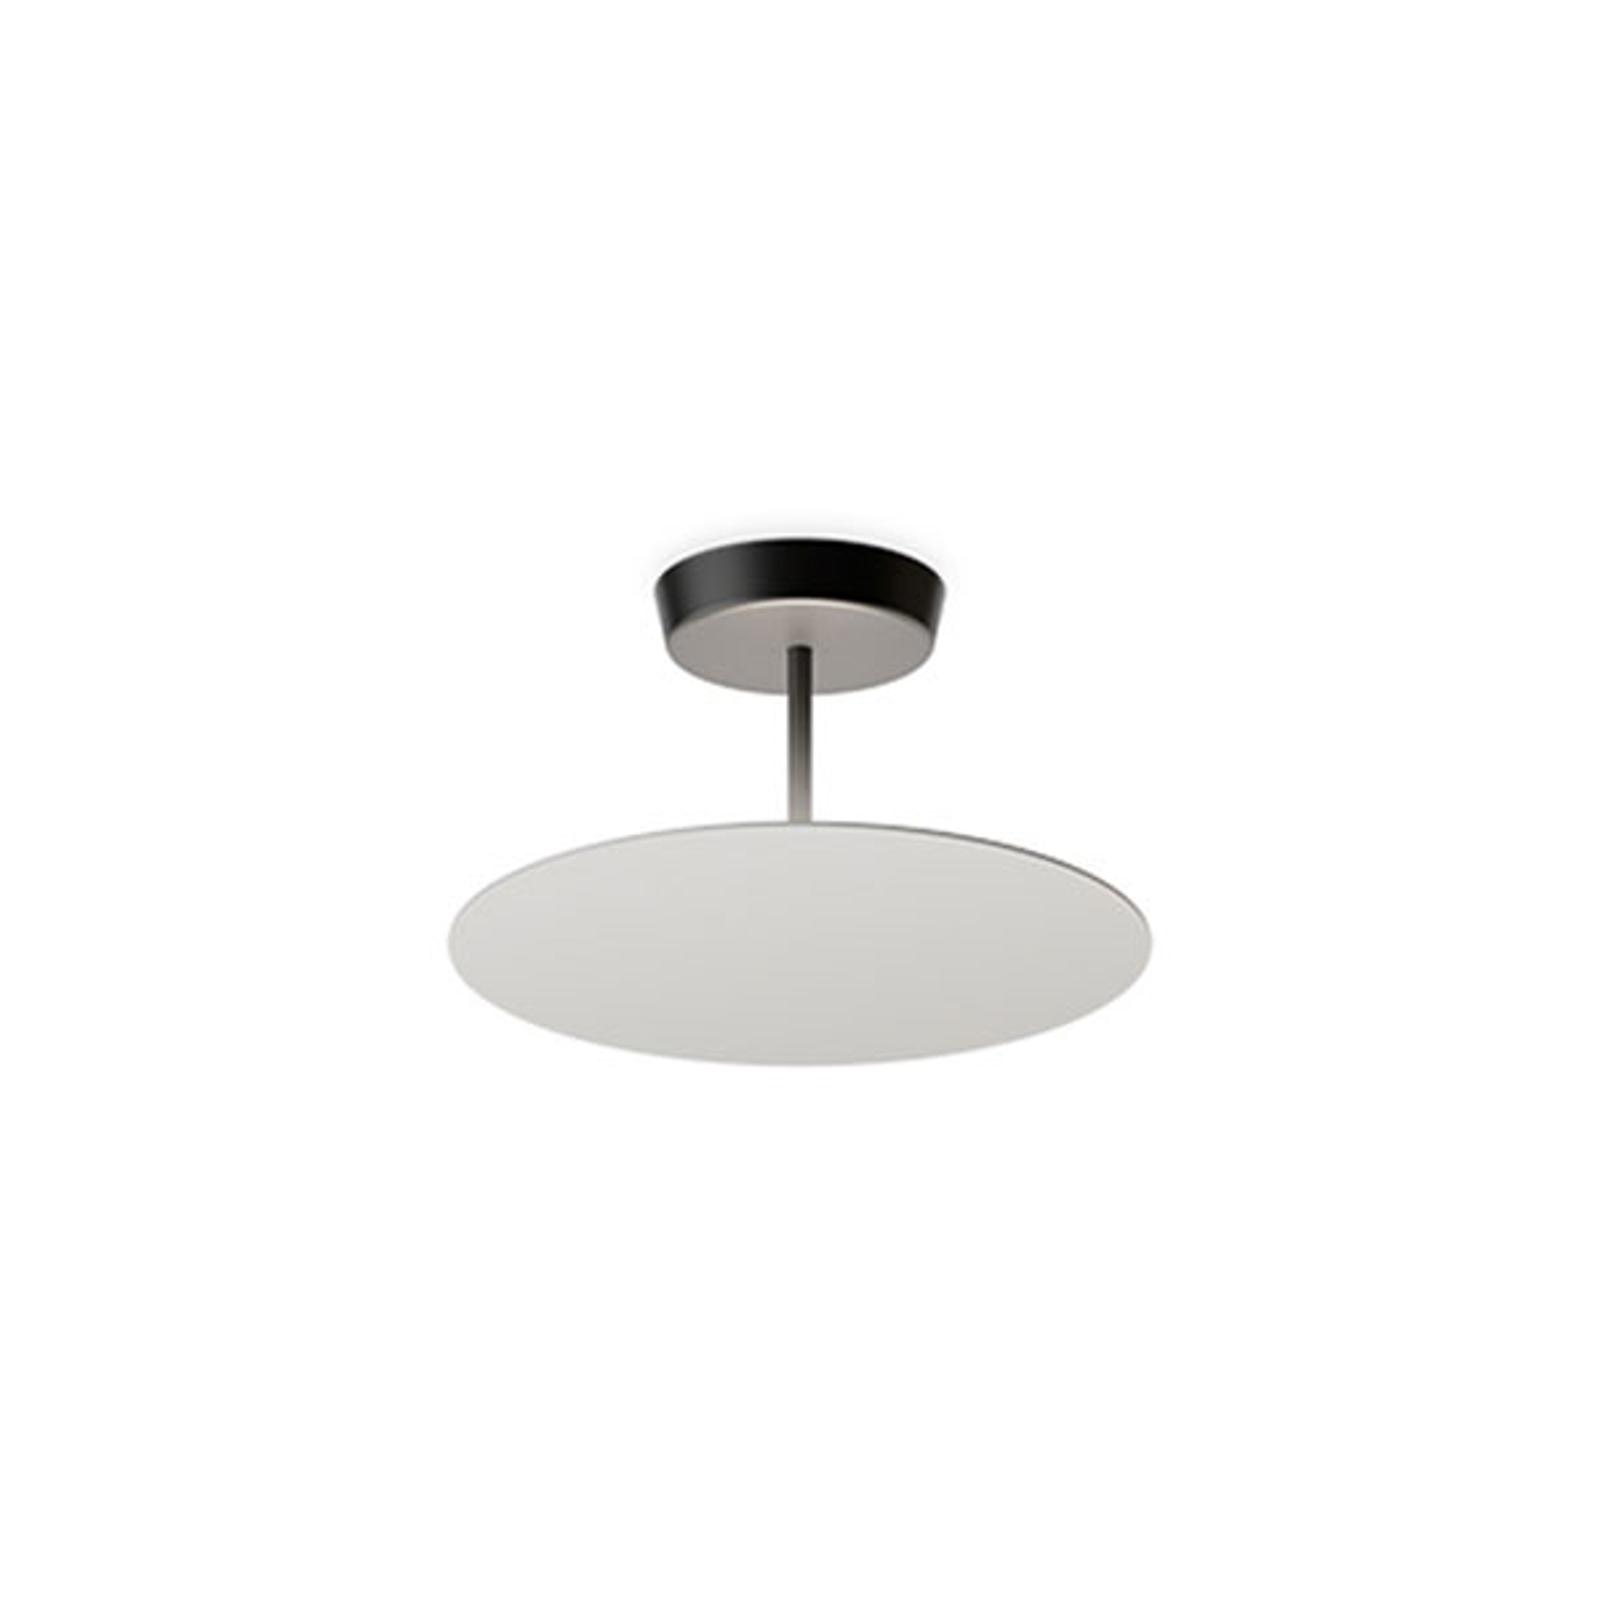 Vibia Flat LED-taklampe 1 lys, Ø 40cm grå L1